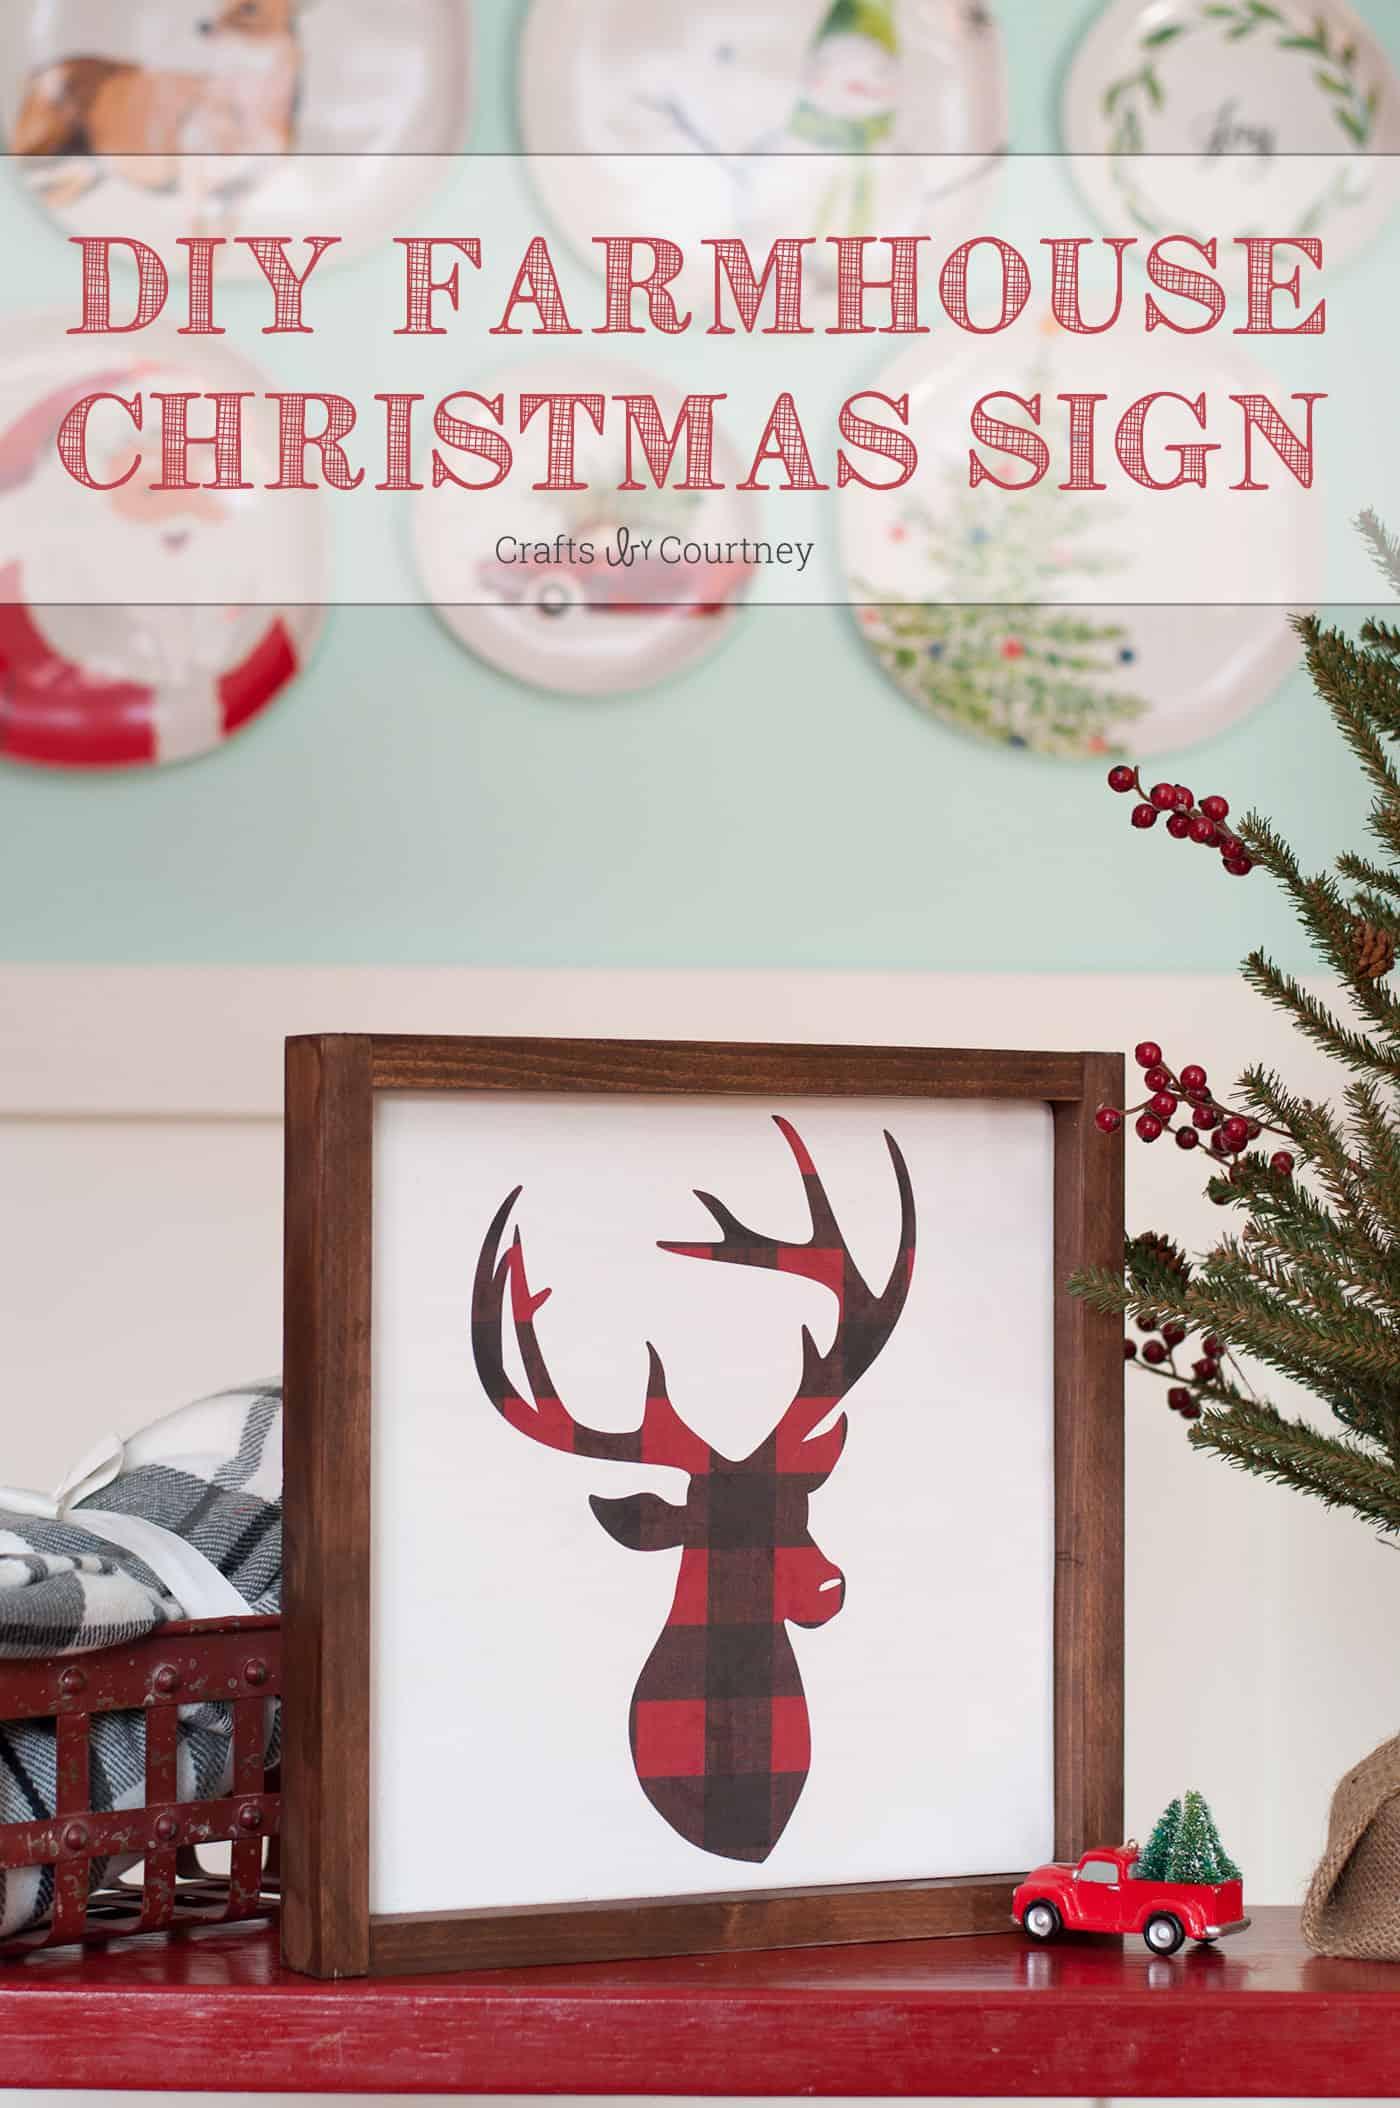 diy farmhouse christmas tree ornaments